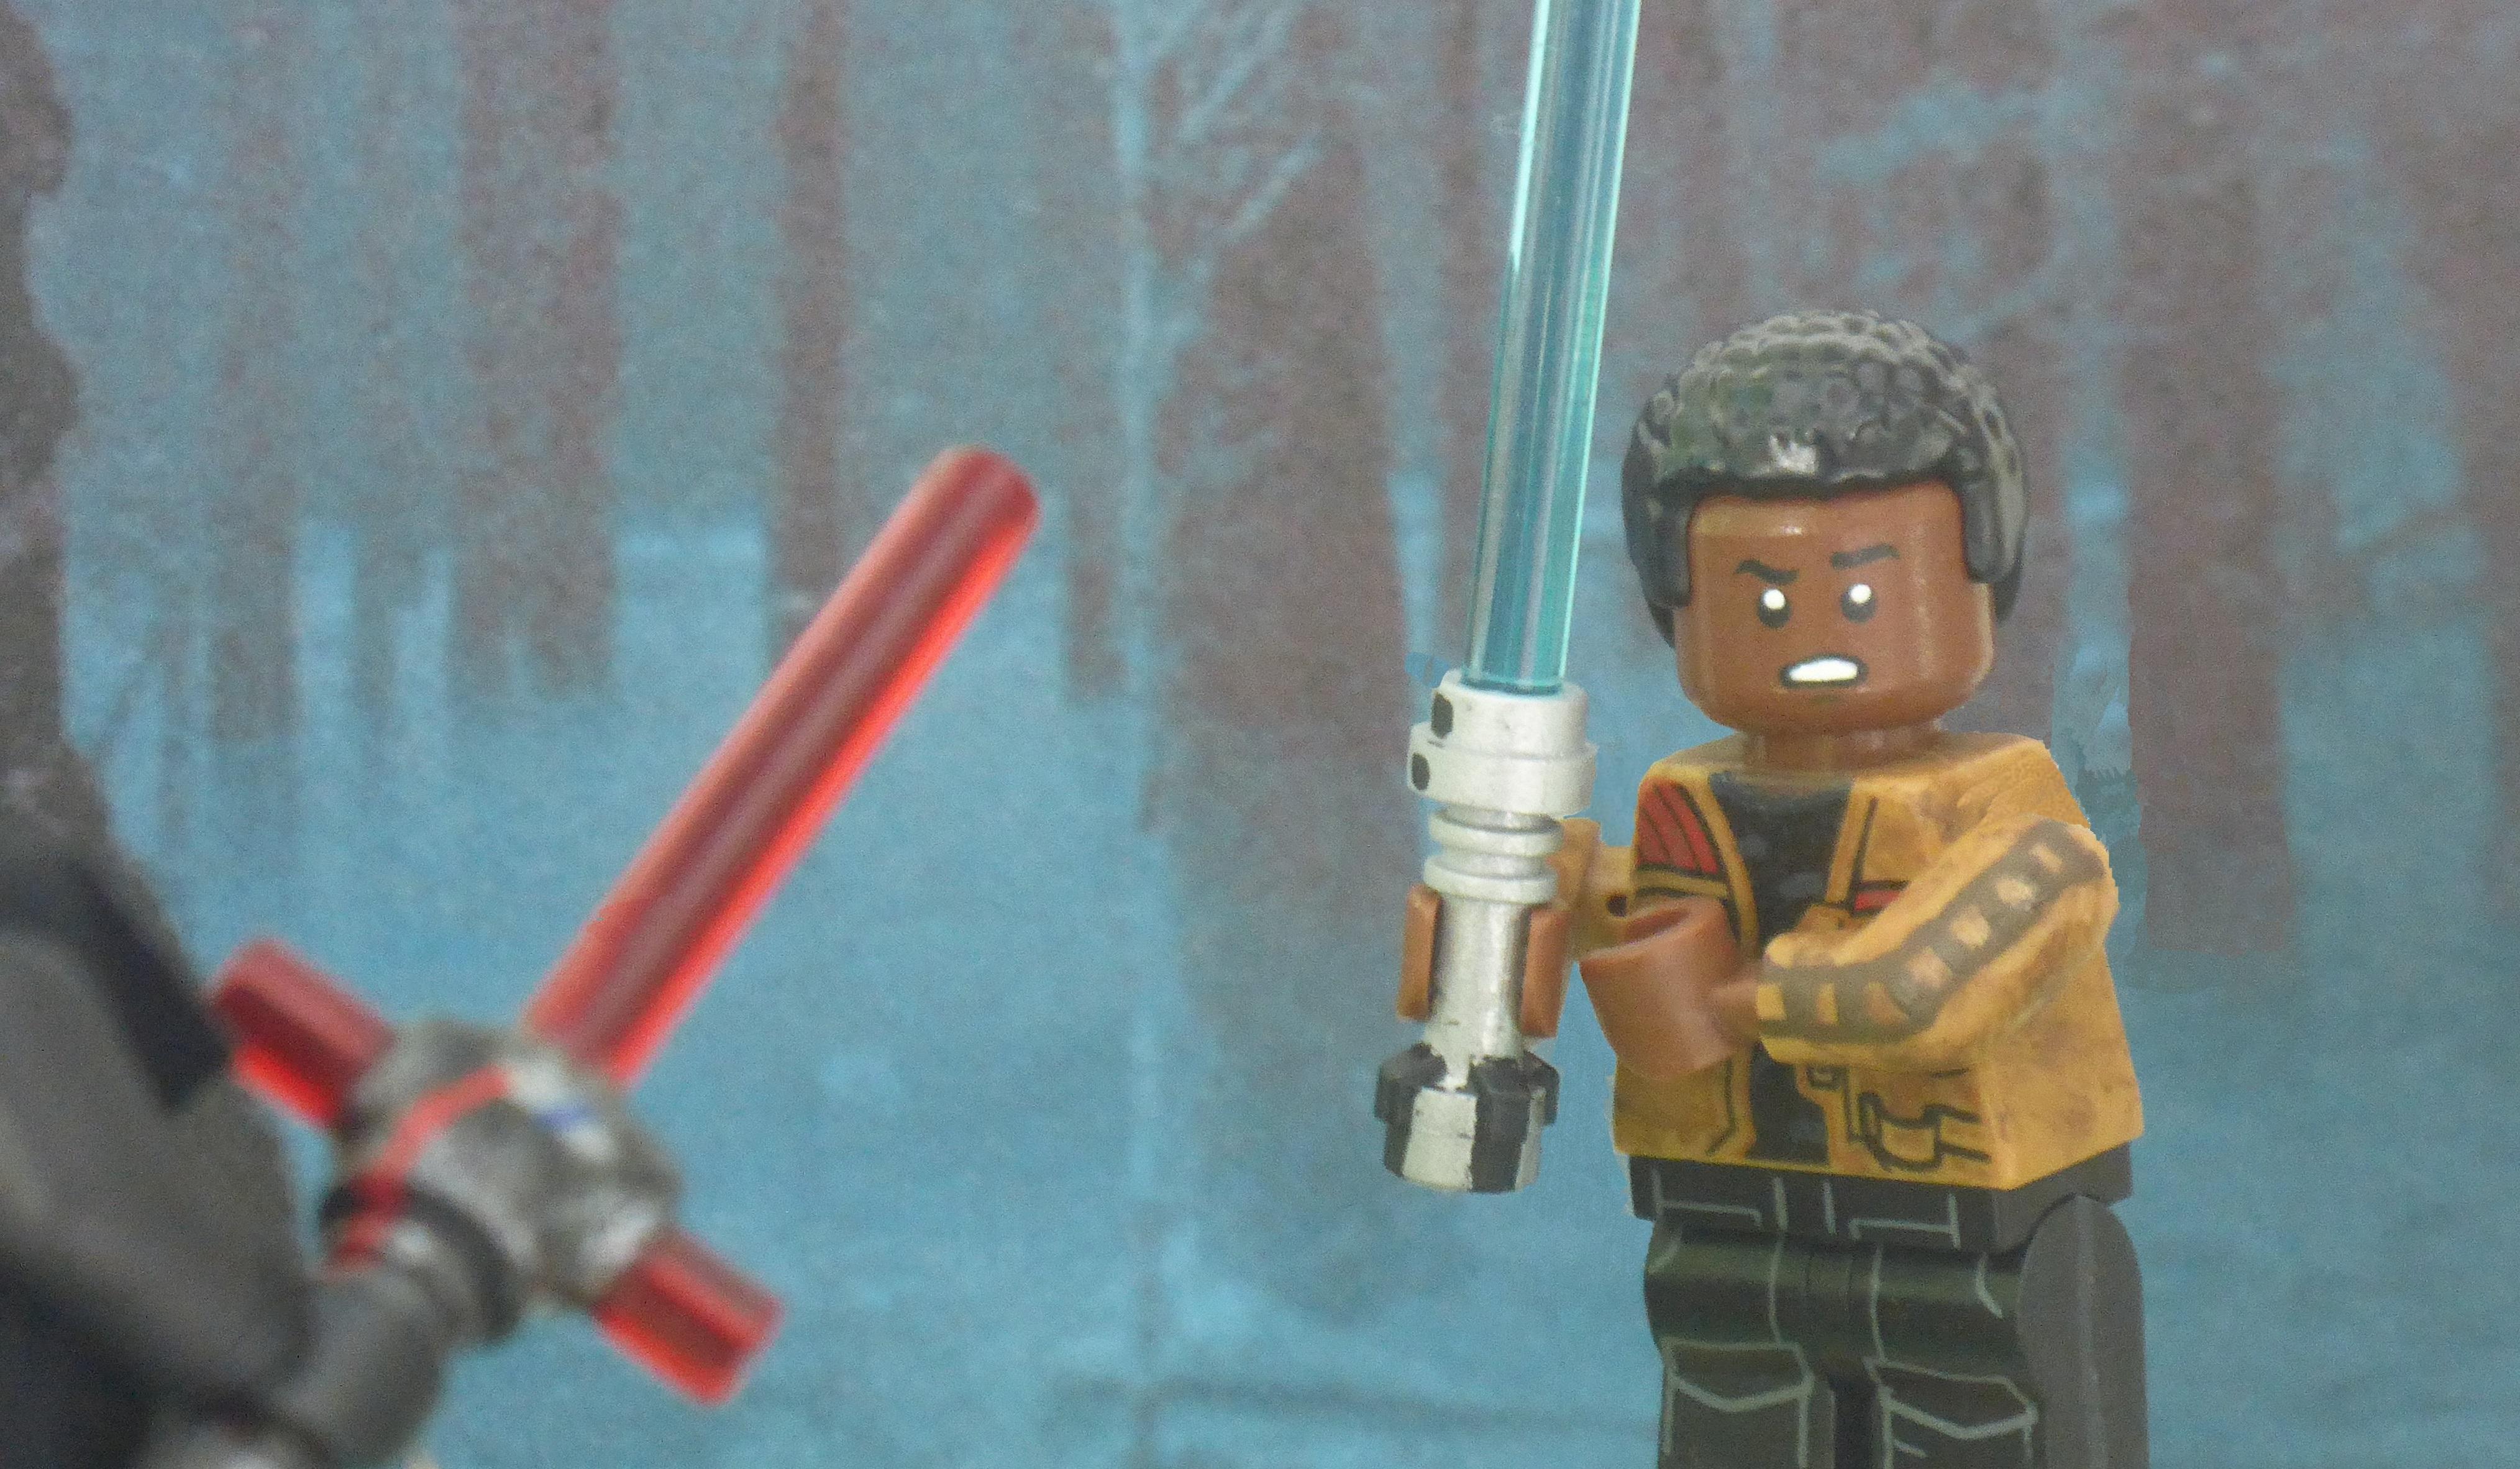 Wallpaper Star Wars The Force Awakens Finn Vs Kylo Ren Starkiller Base Ben Solo Lightsaber 4056x2365 943149 Hd Wallpapers Wallhere